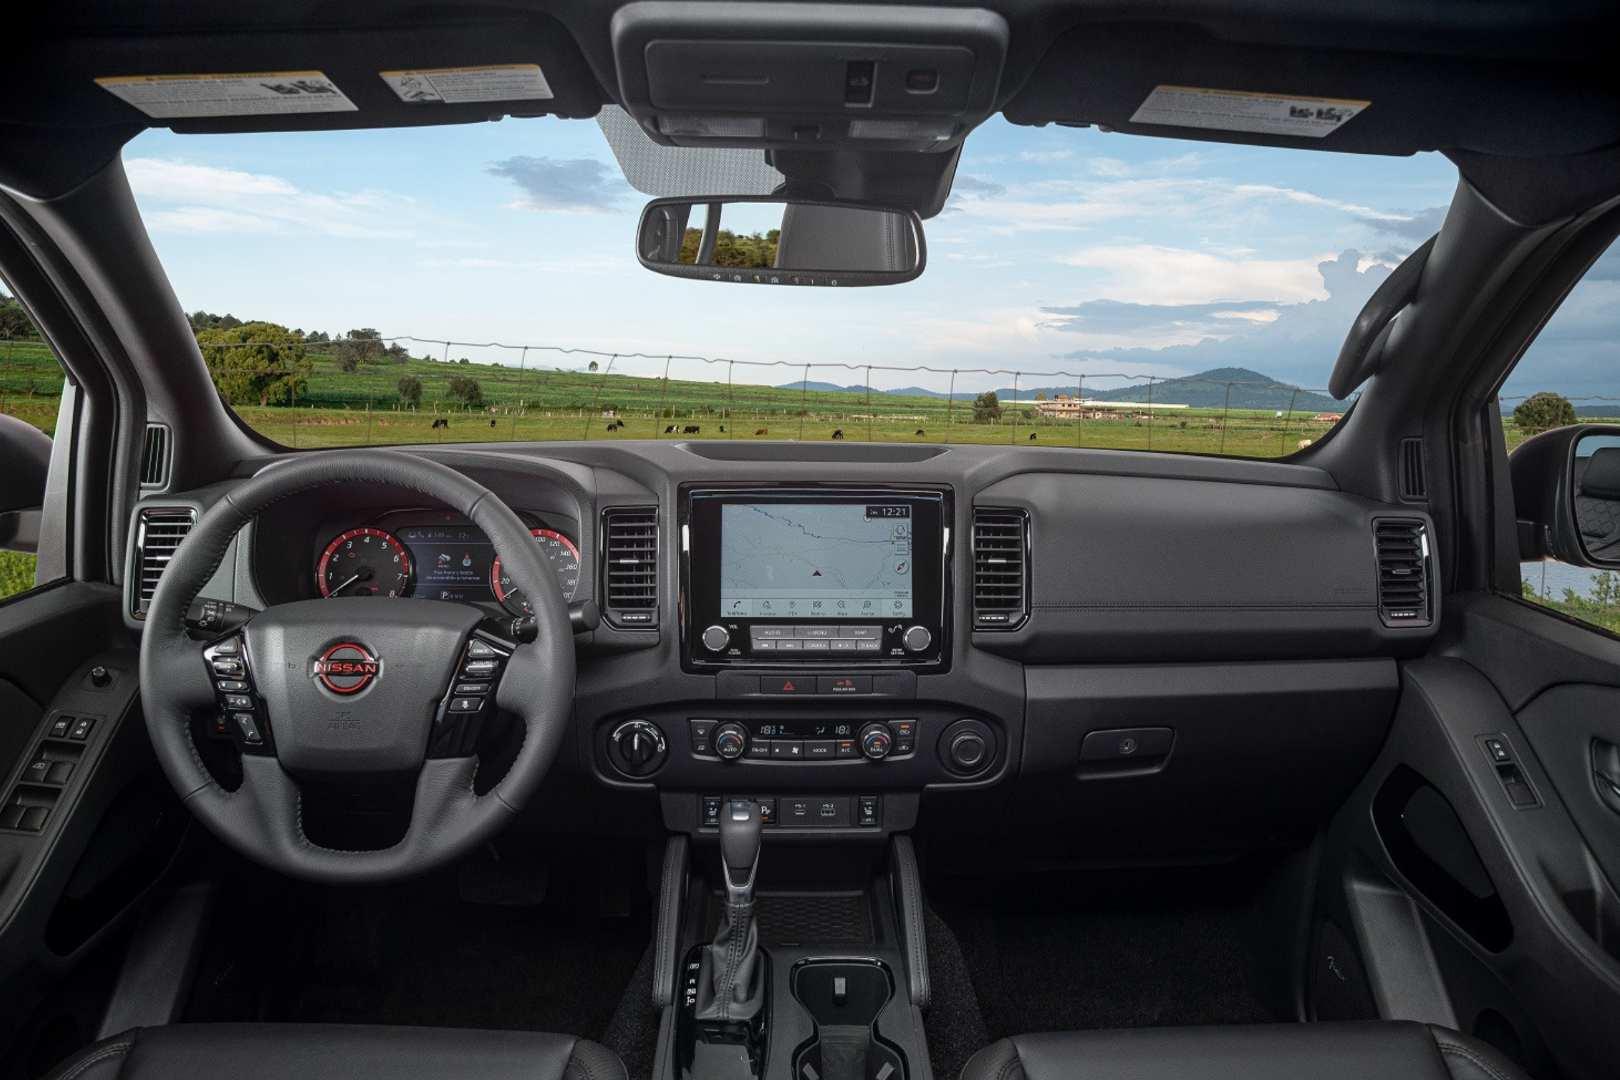 Nissan Frontier V6 PRO-4X